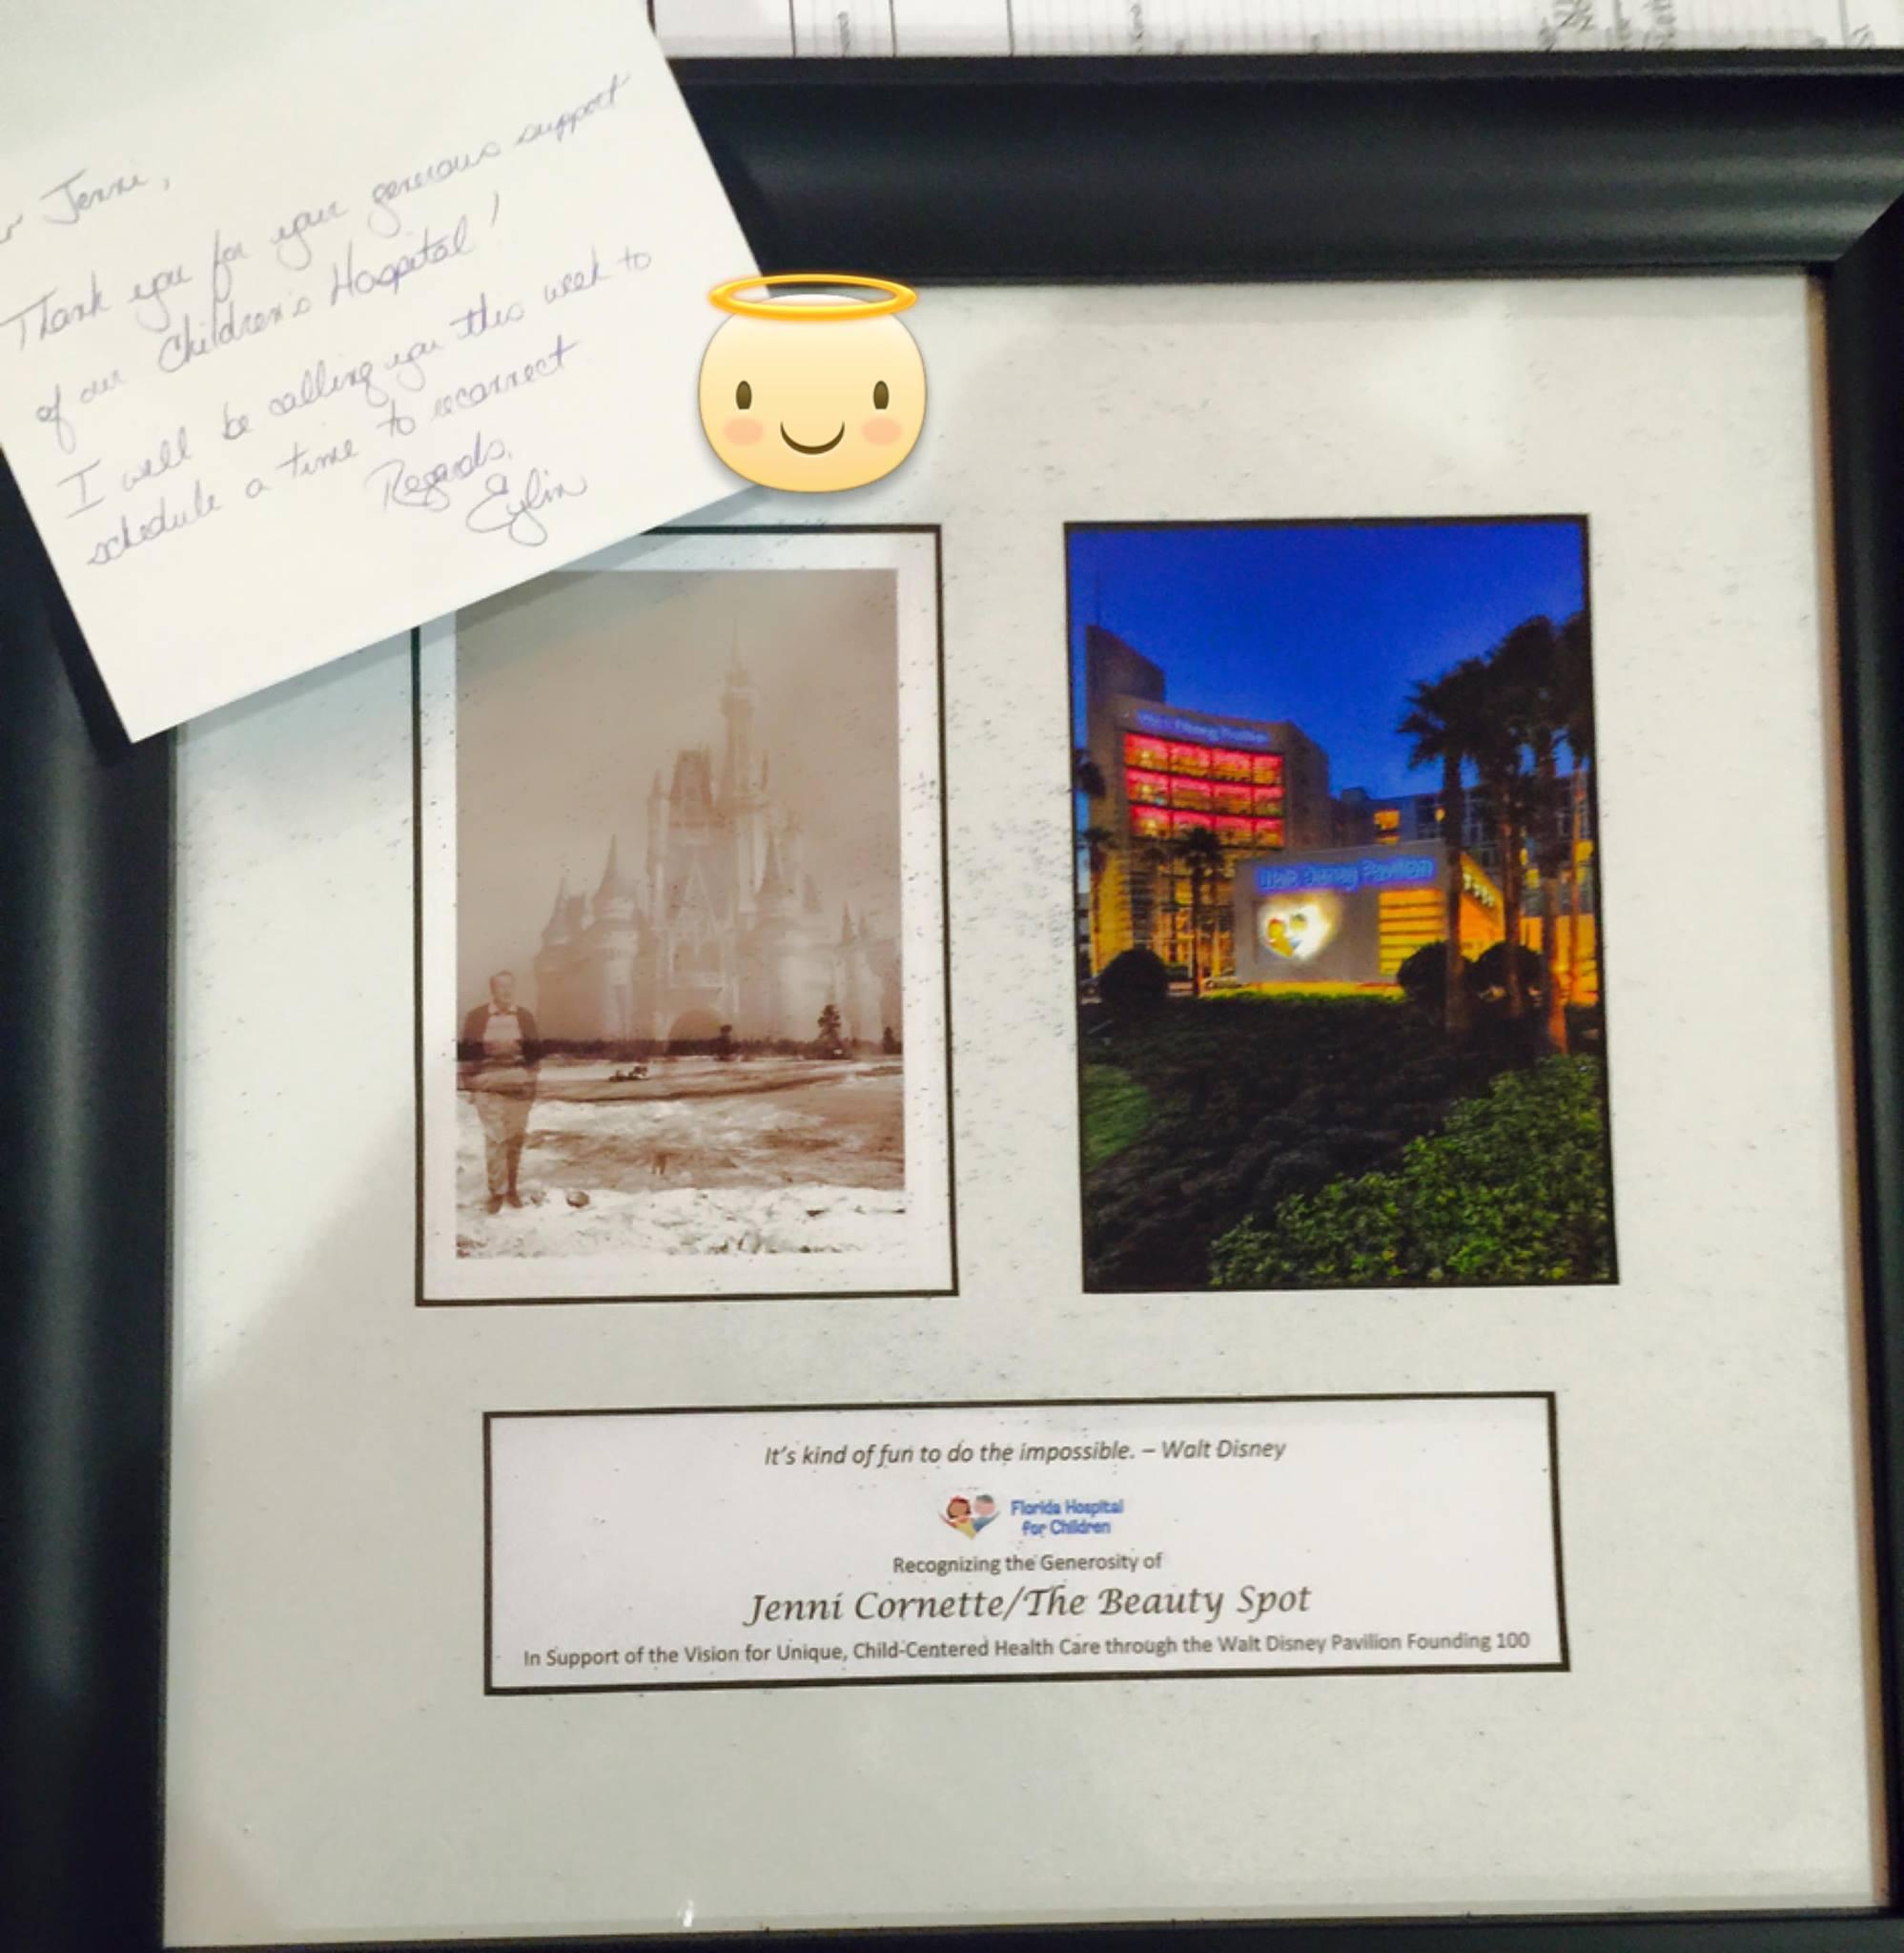 Philanthropy work to Florida Children's Hospital - Jenni Cornette - Founding 100.